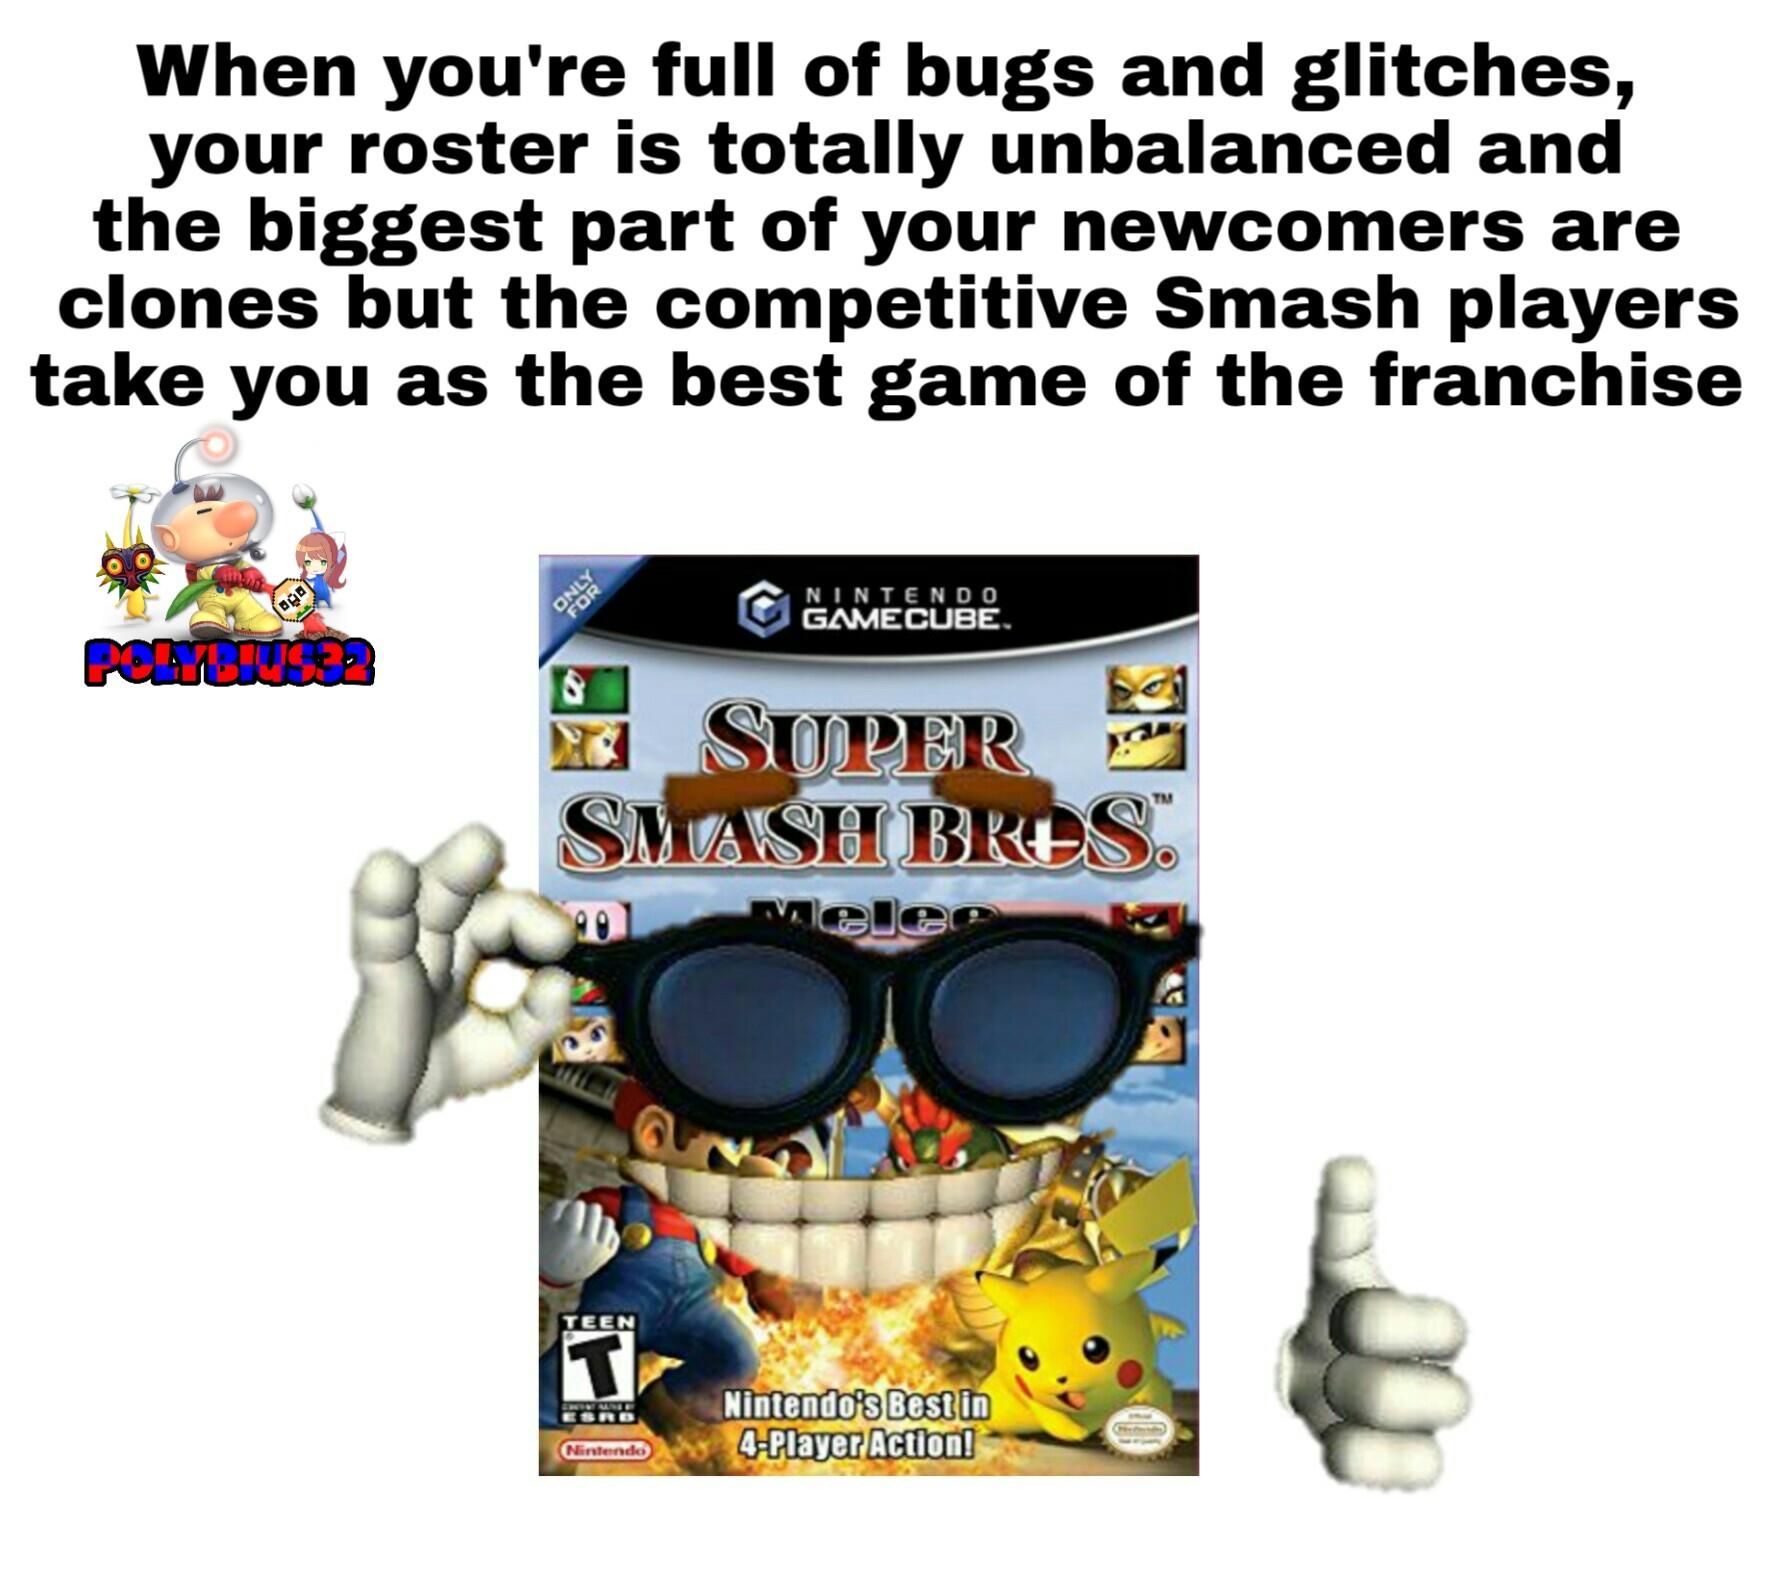 Meleefags in a nutshell - meme